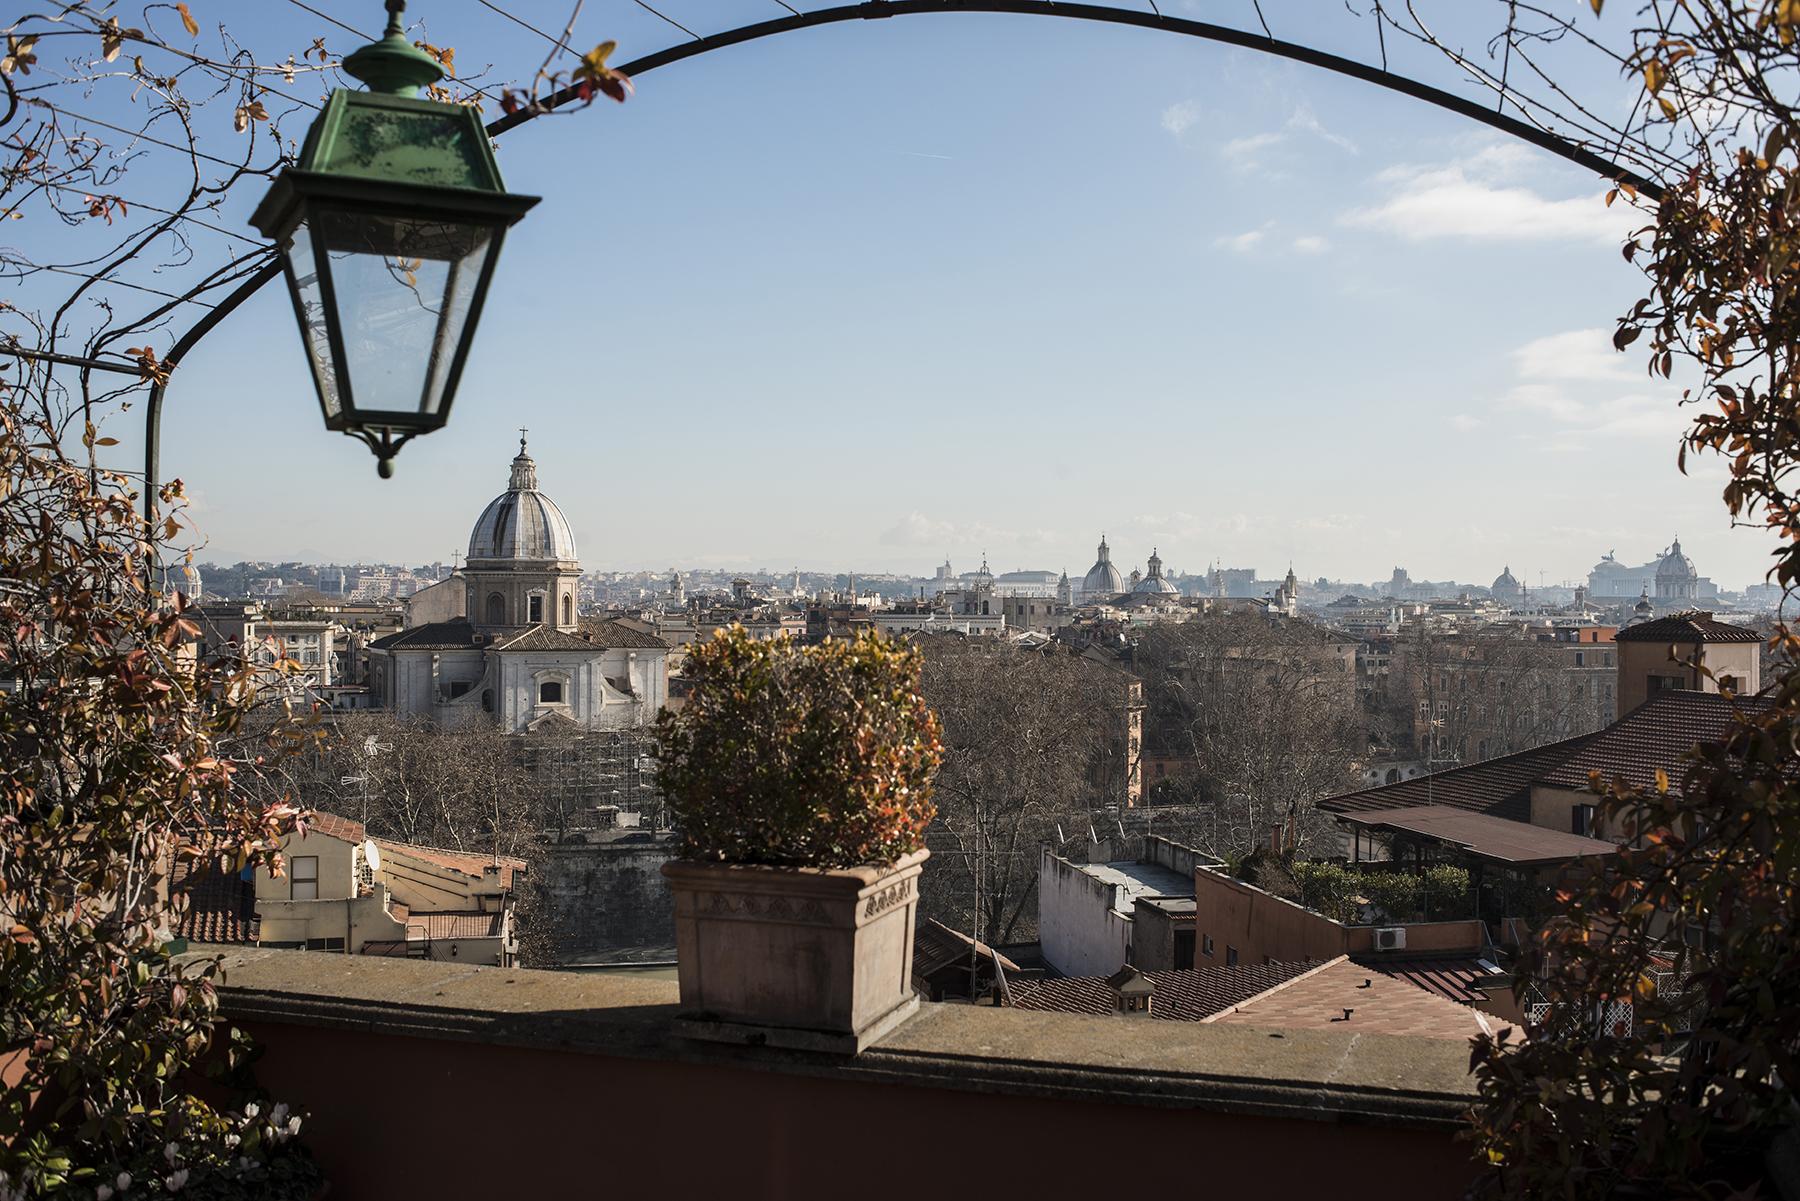 Apartamento por un Venta en Duplex Penthouse with stunning views of the eternal city Salita di Sant'onofrio Rome, Roma 00165 Italia